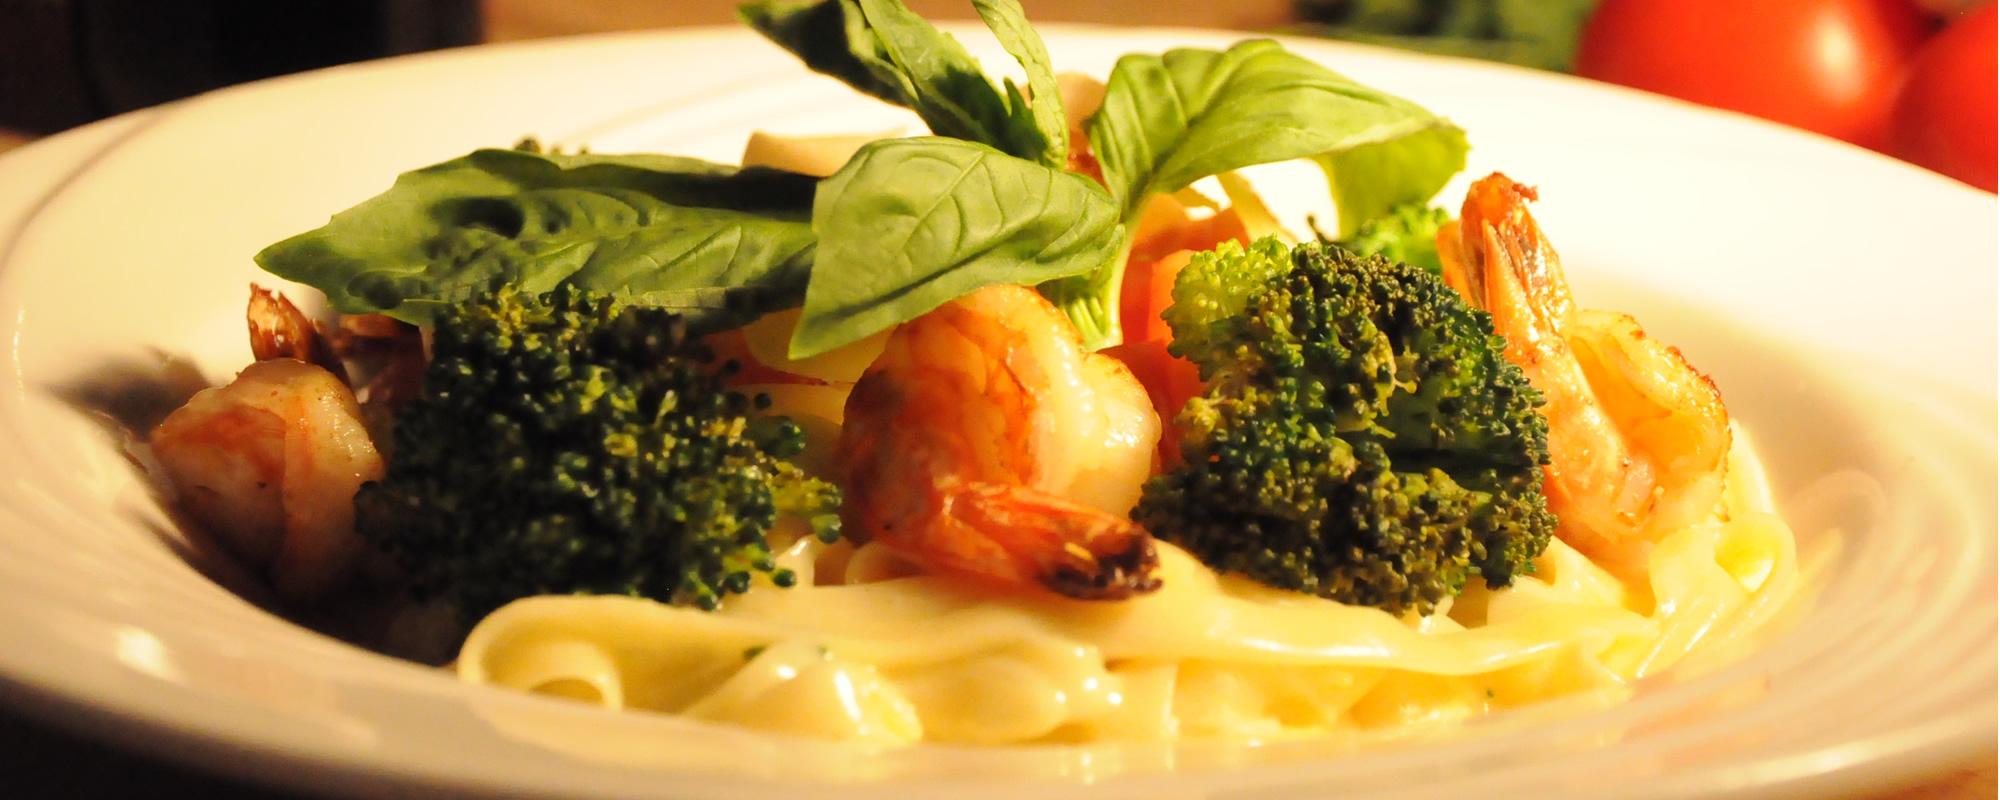 Restaurant Edison Nj Italian